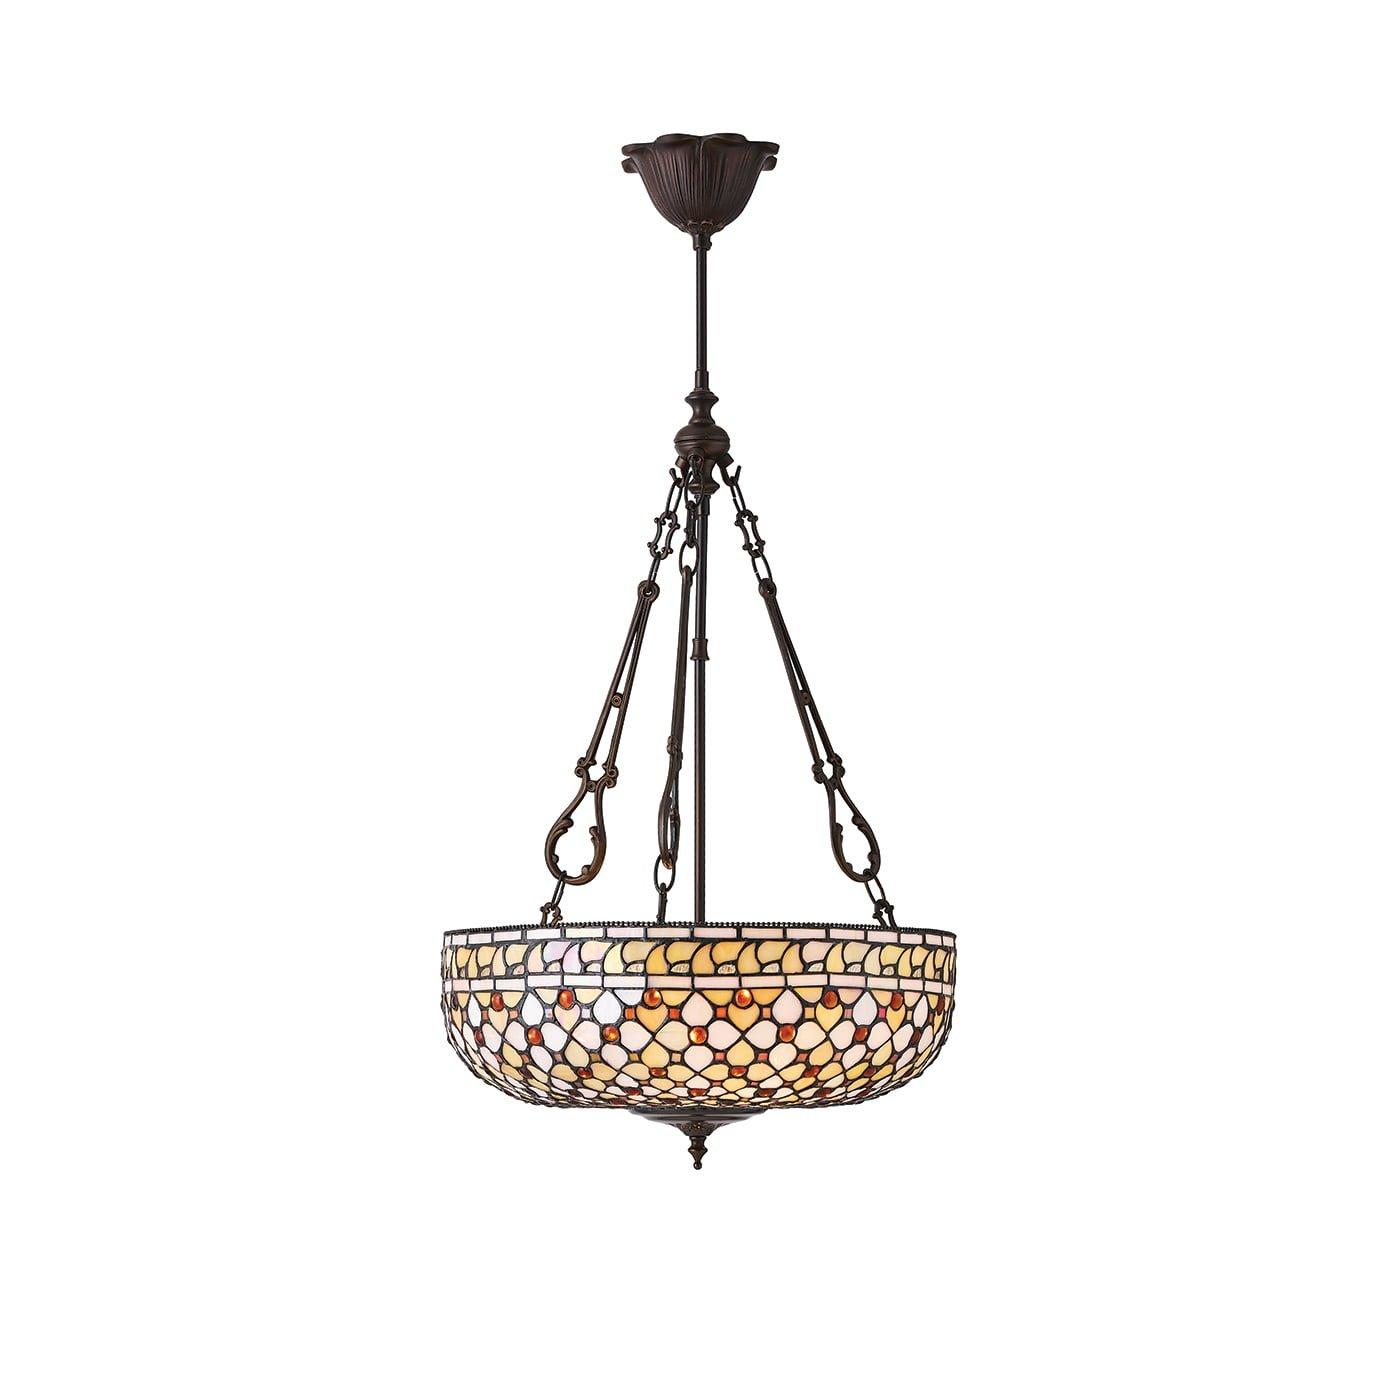 Interiors 1900 64277 Mille feux Large inverted 3lt pendant, Tiffany